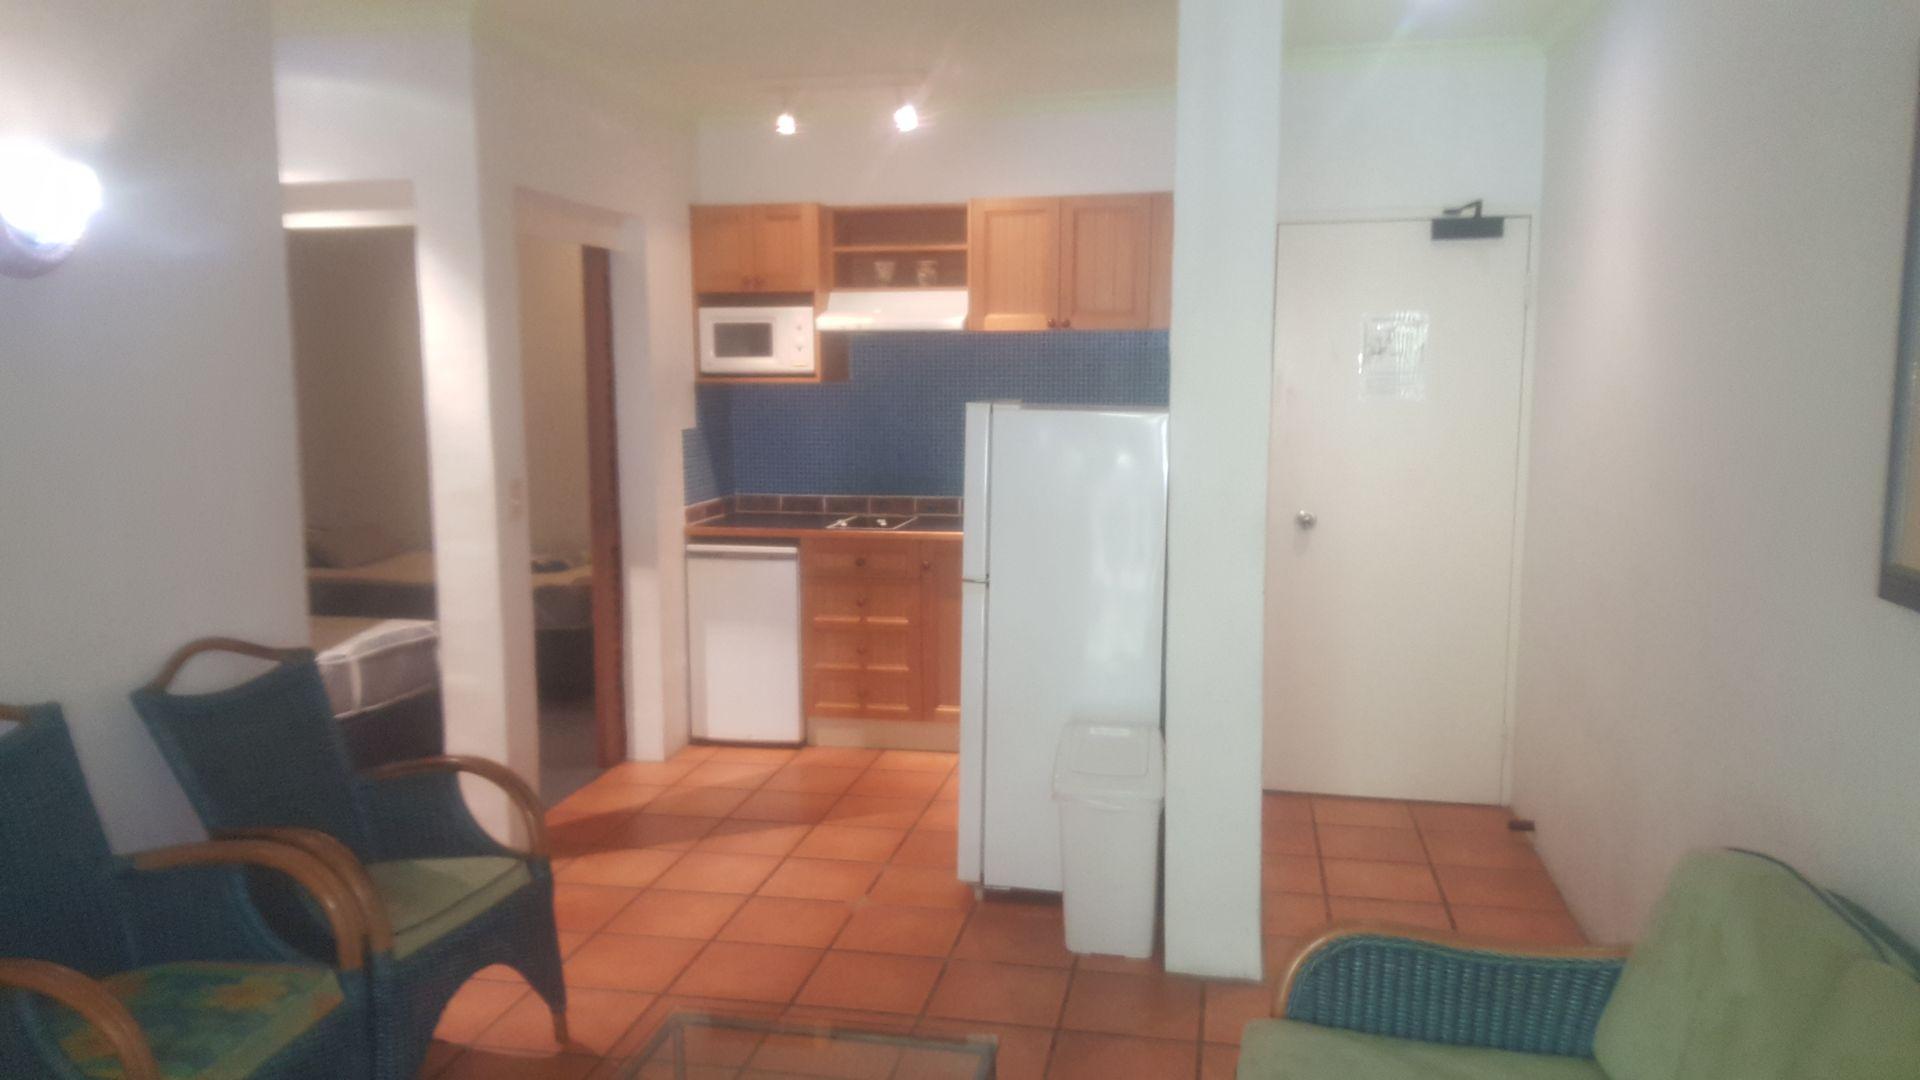 23/62-64 Davidson Street, Port Douglas QLD 4877, Image 4